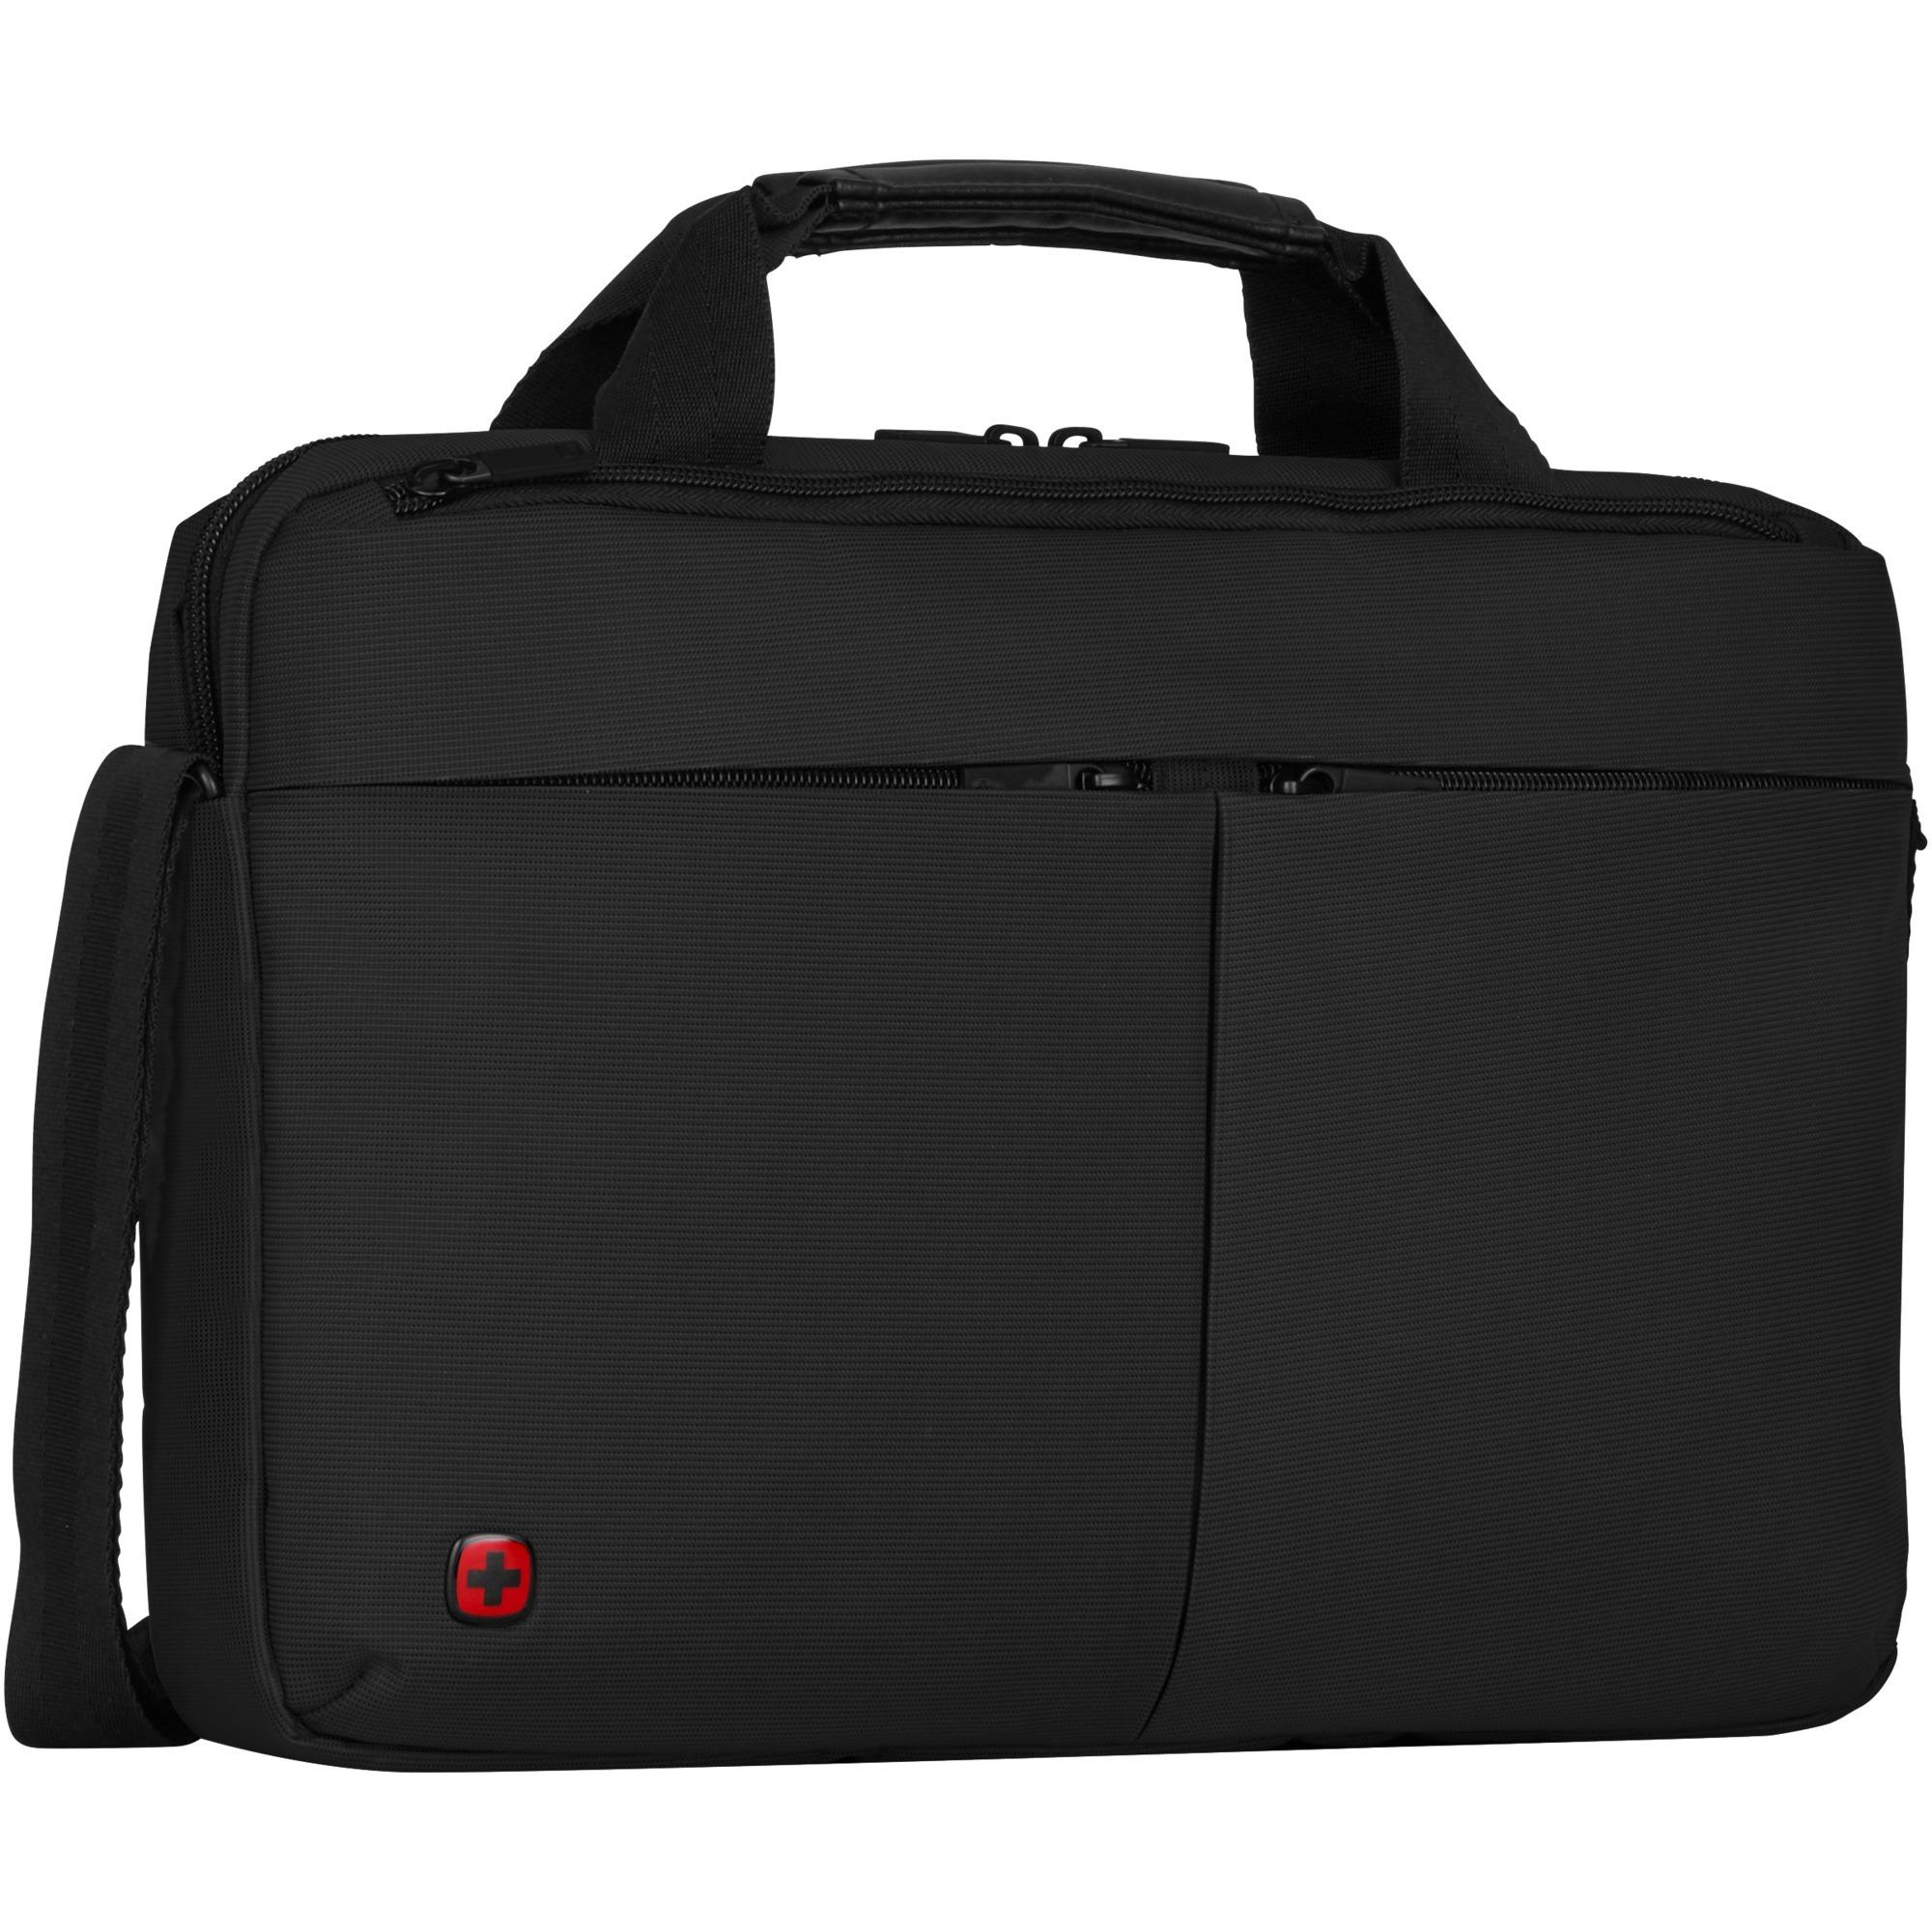 "Format 14 maletines para portátil 35,6 cm (14"") Maletín Negro, Bolsa"